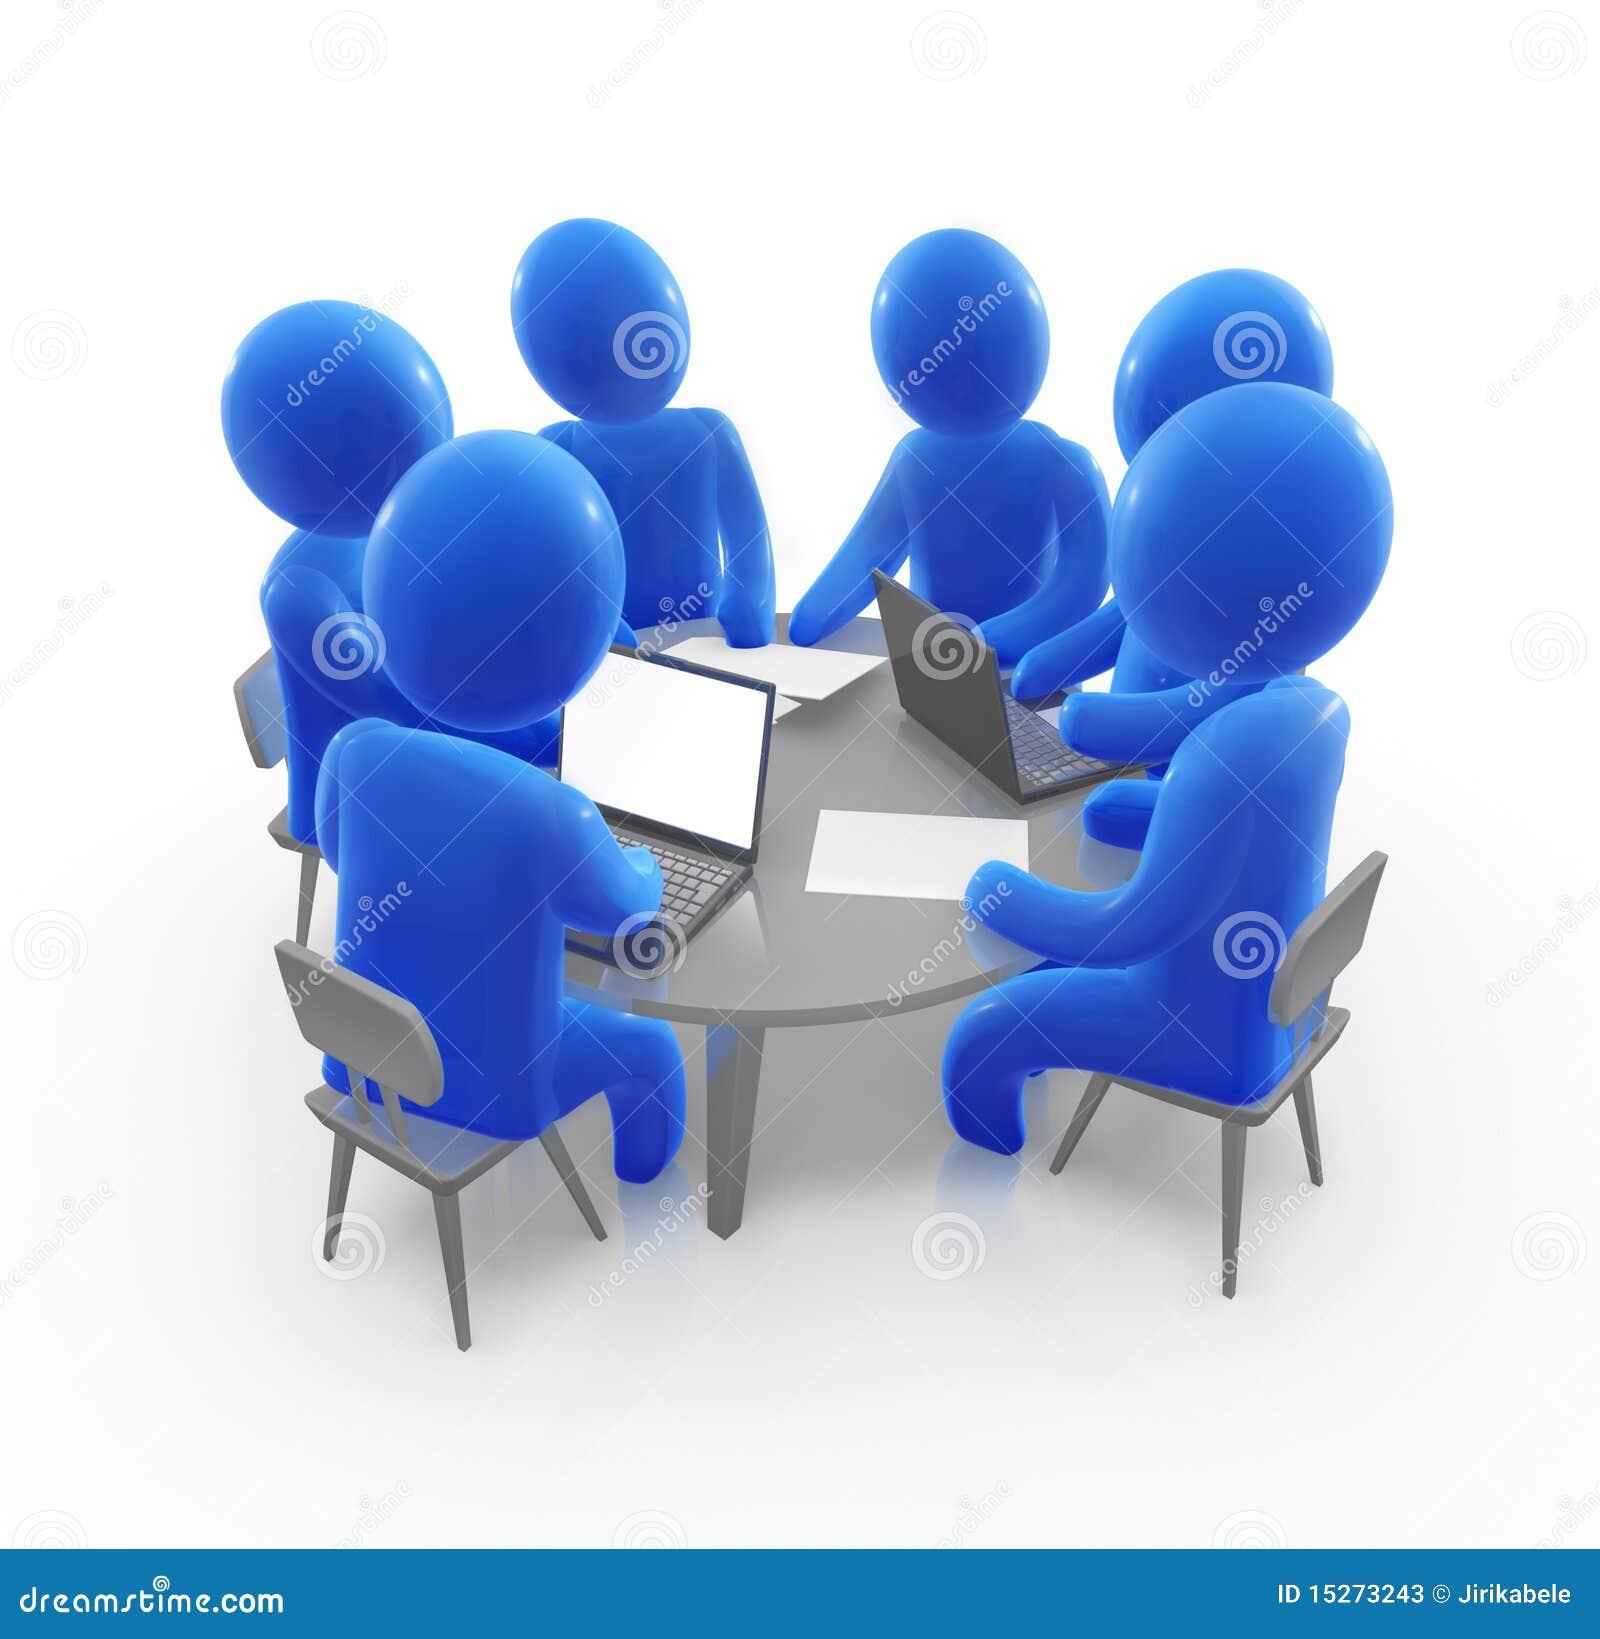 Round table meeting icon - Team Meeting Stock Photos Image 15273243